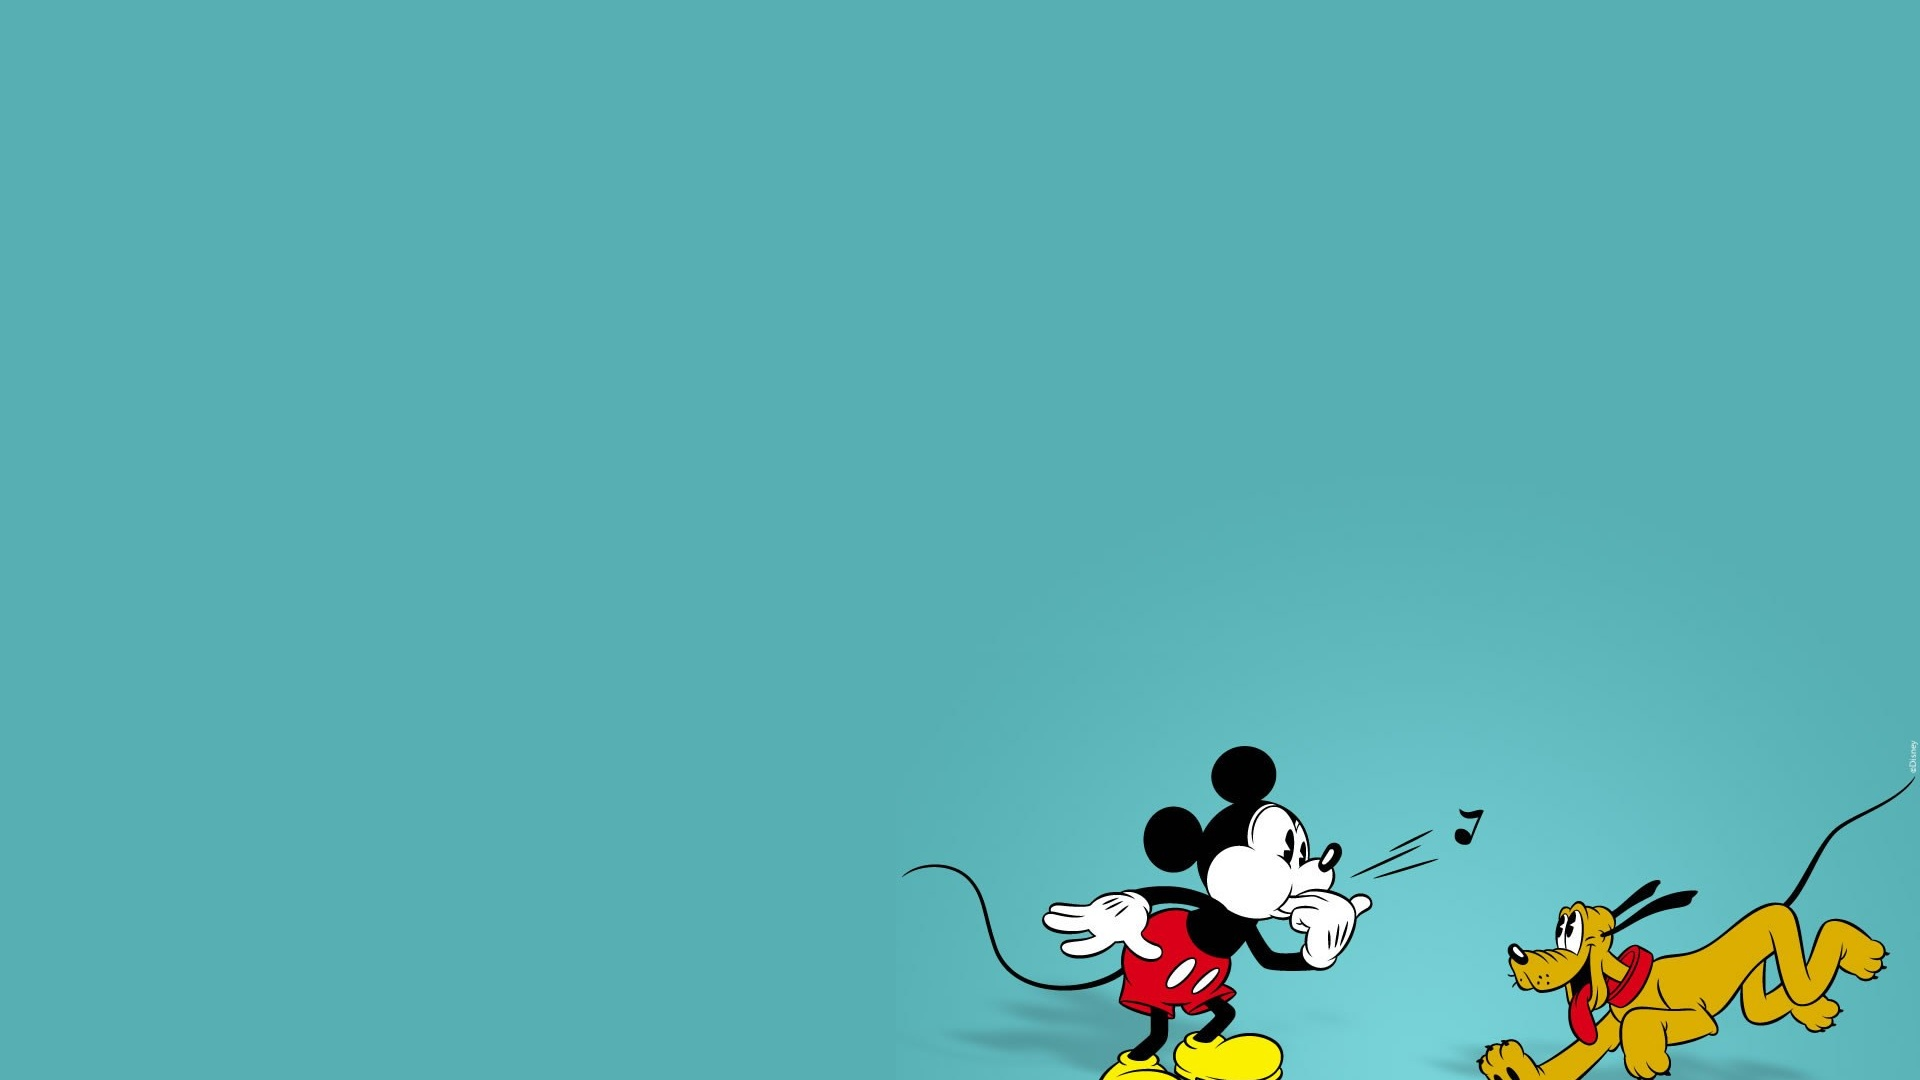 Disney windows wallpaper